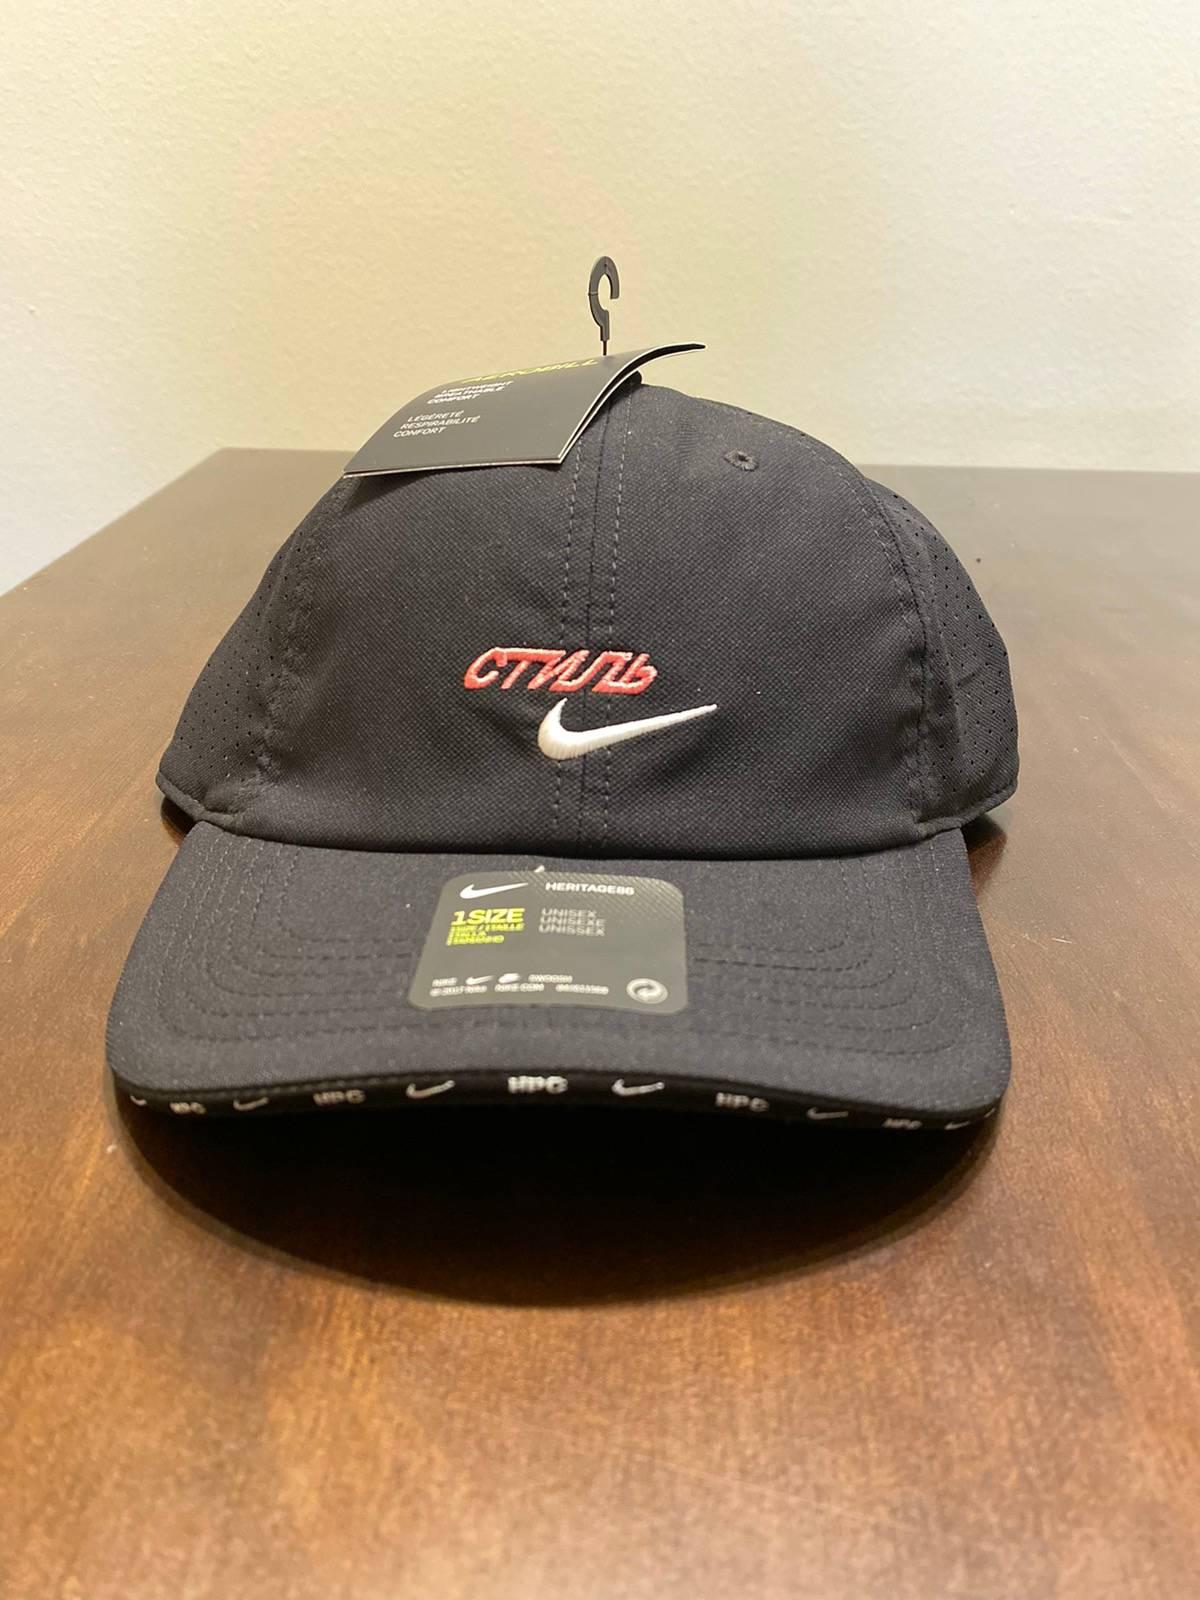 Informar Saga por favor confirmar  Nike Nike X Heron Preston Nrg H86 Hat Black | Grailed